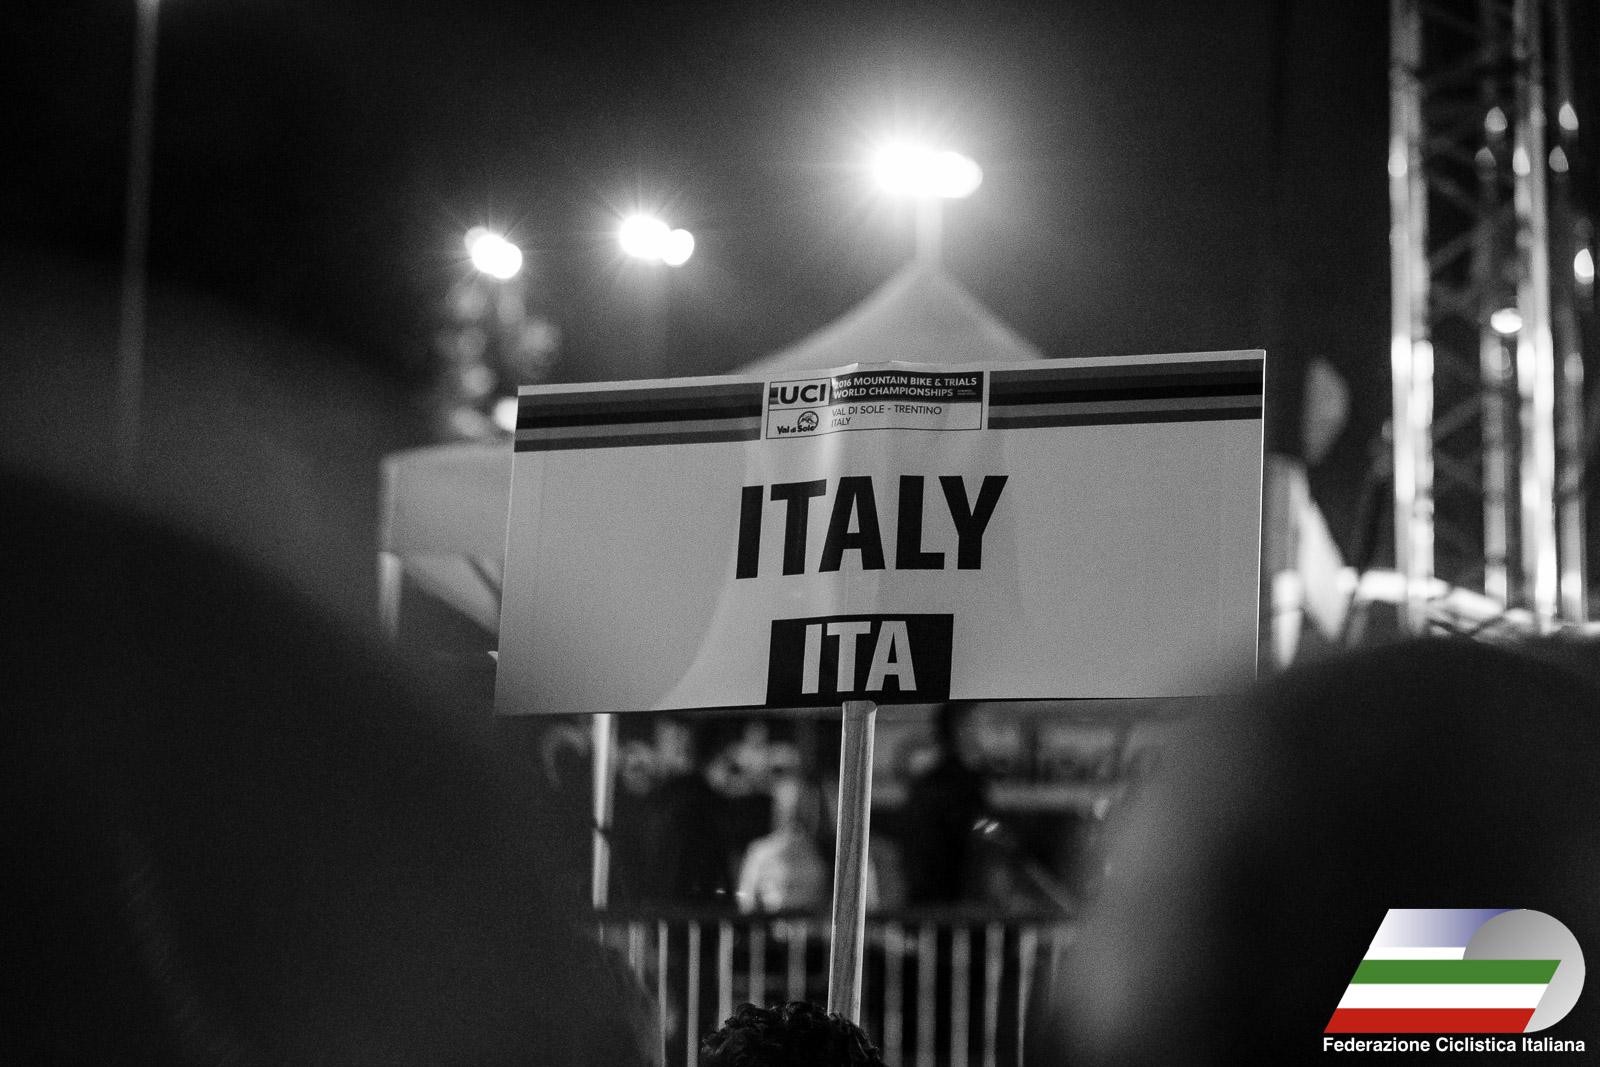 italia_dh_vds_wednesday_49